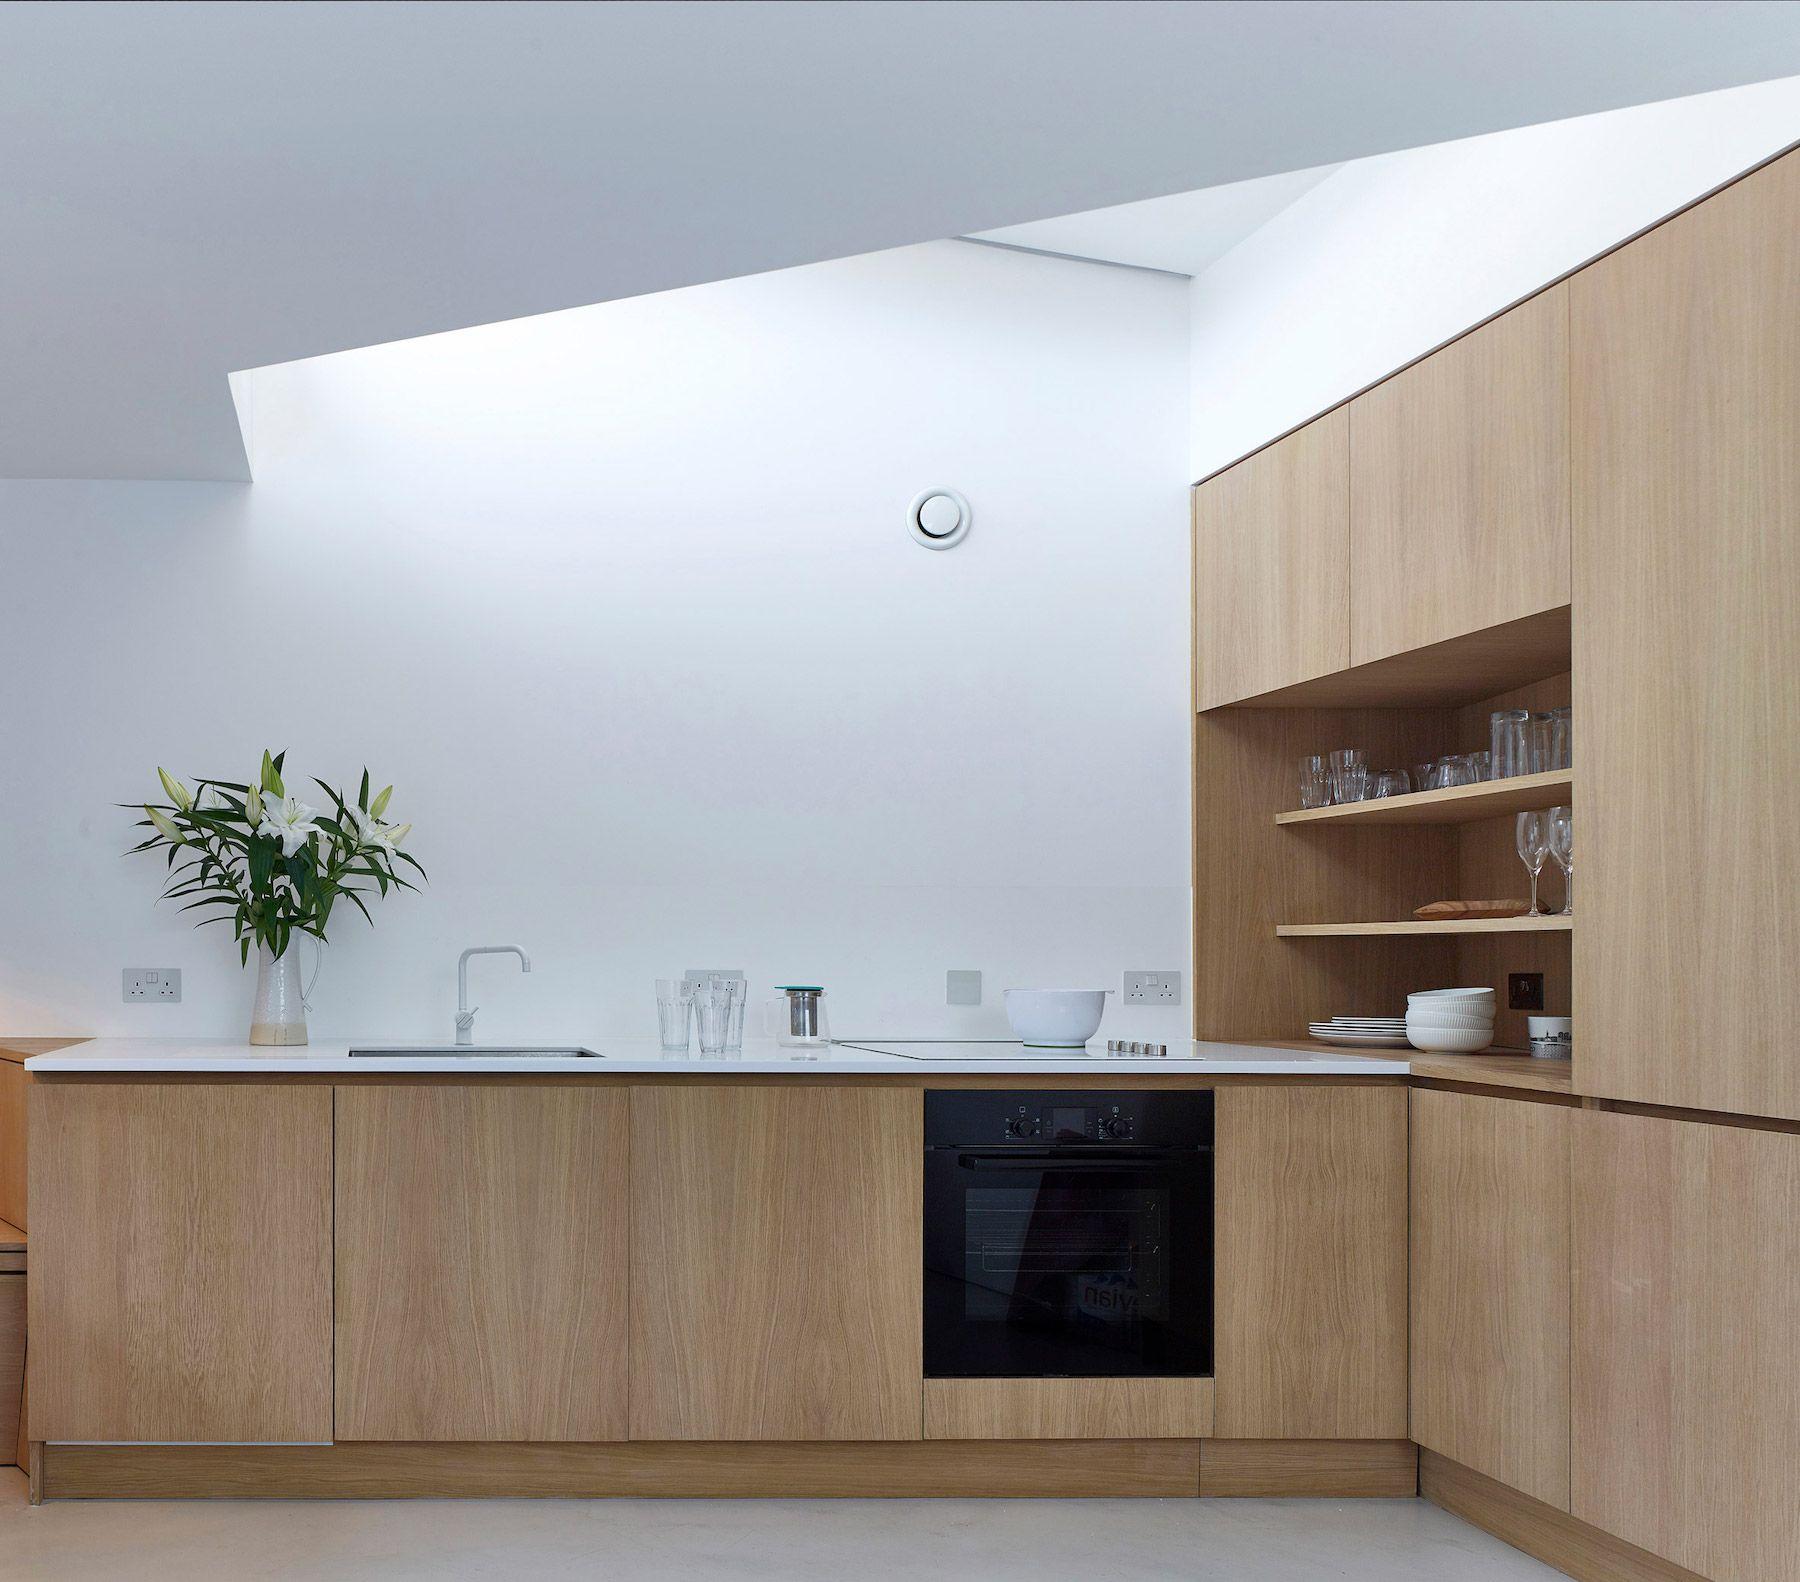 Whole House | RUSTIC Minimalism | Pinterest | Small garage, South ...